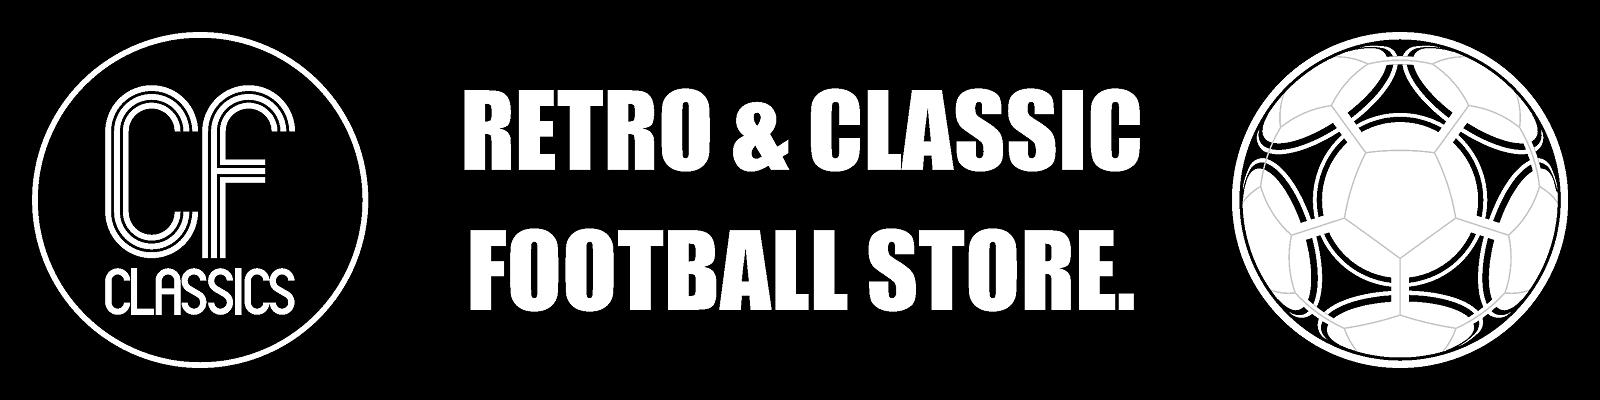 Retro Football Store